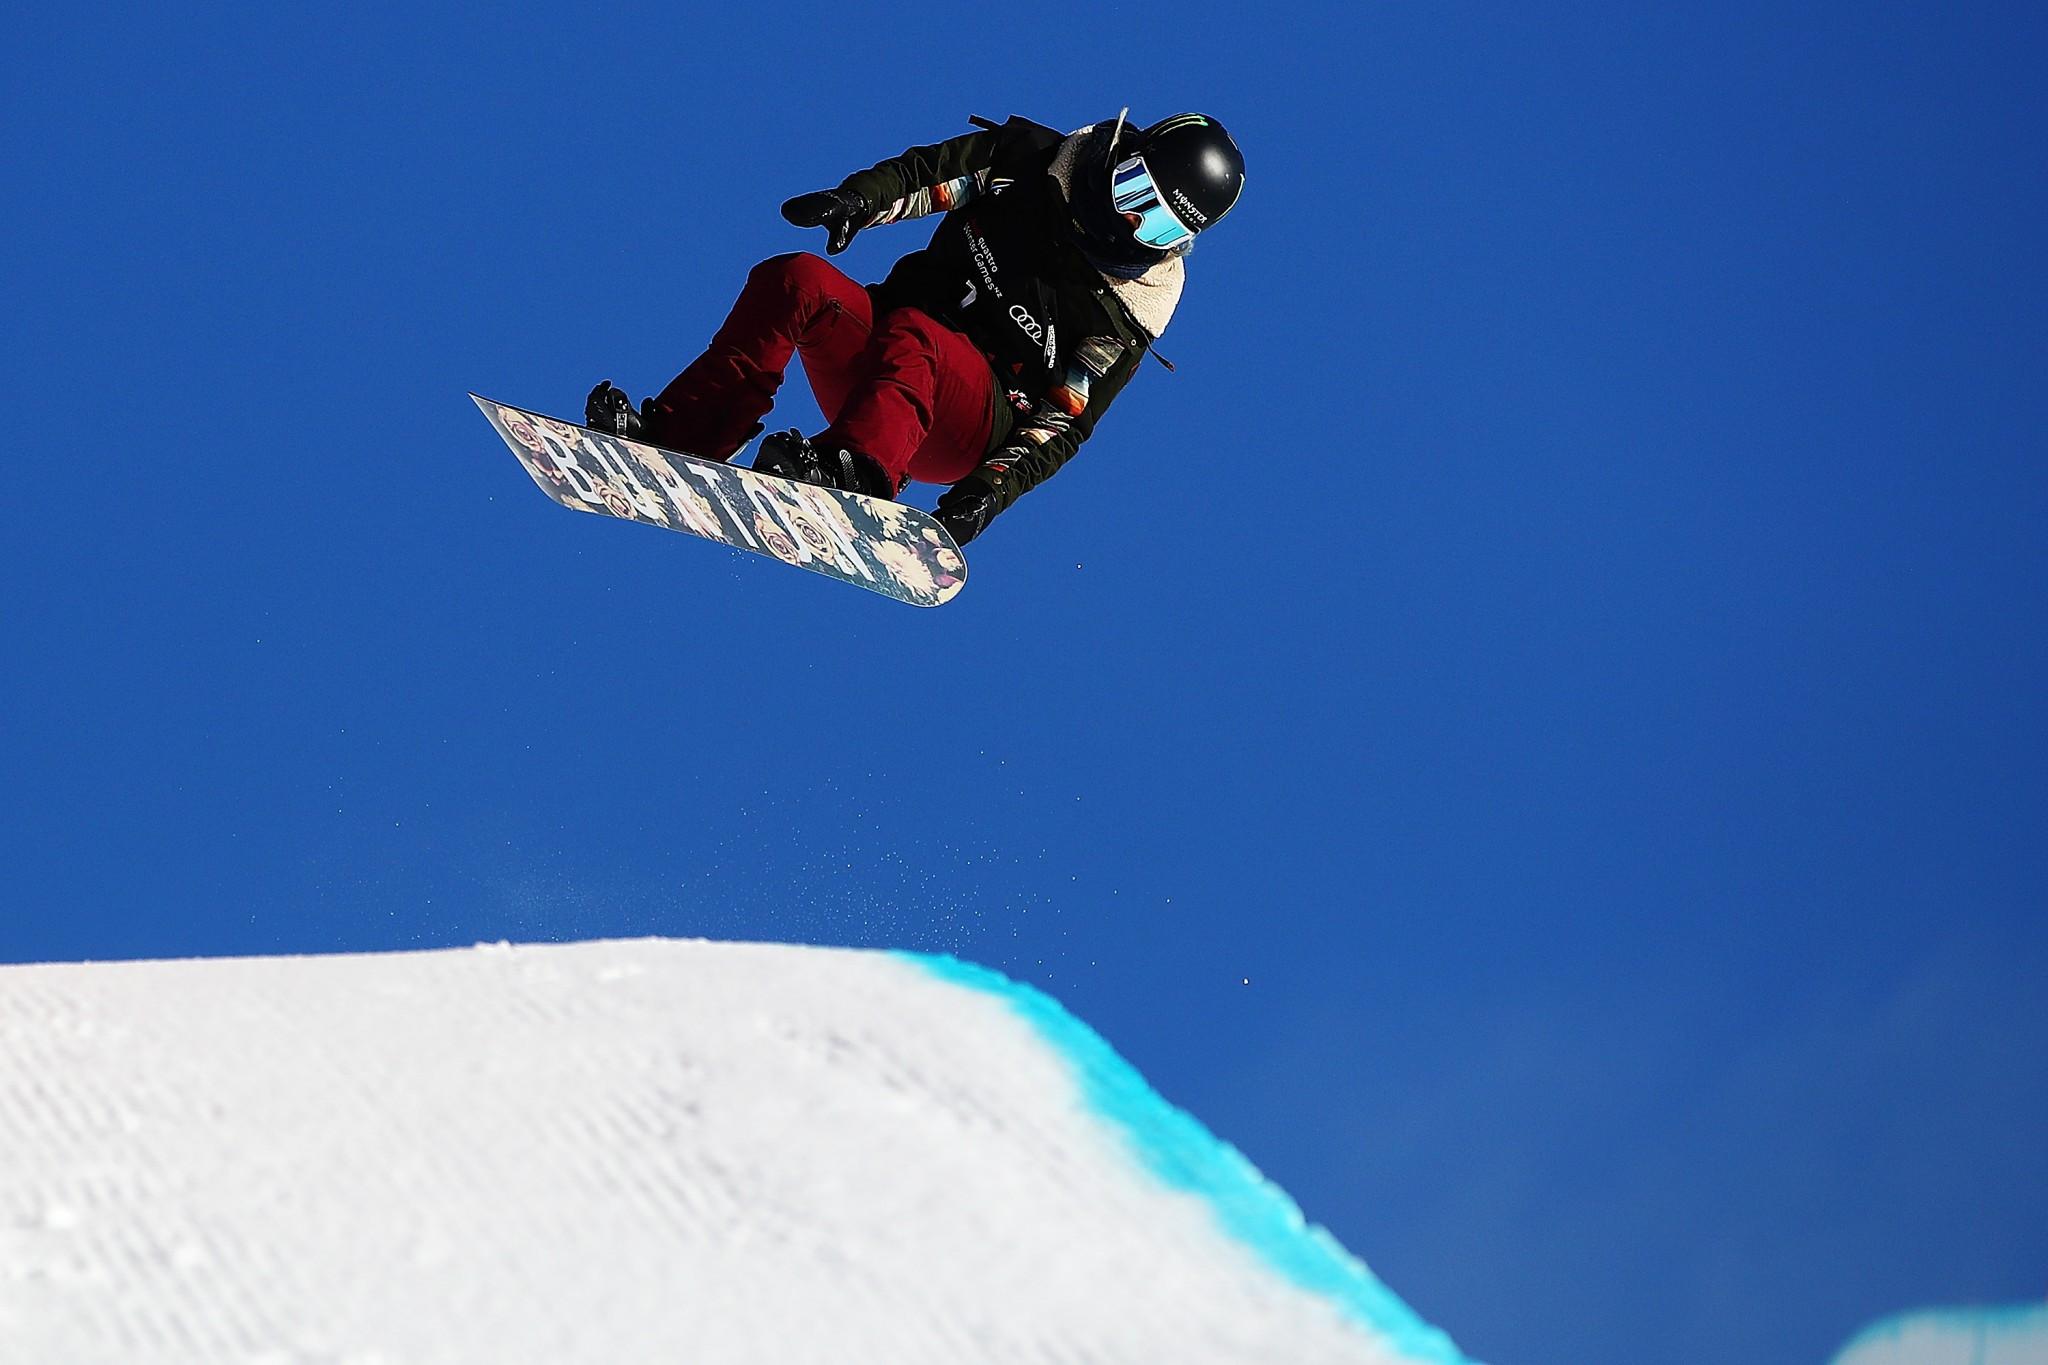 Kim stars at FIS Snowboard Halfpipe World Cup in Cardrona